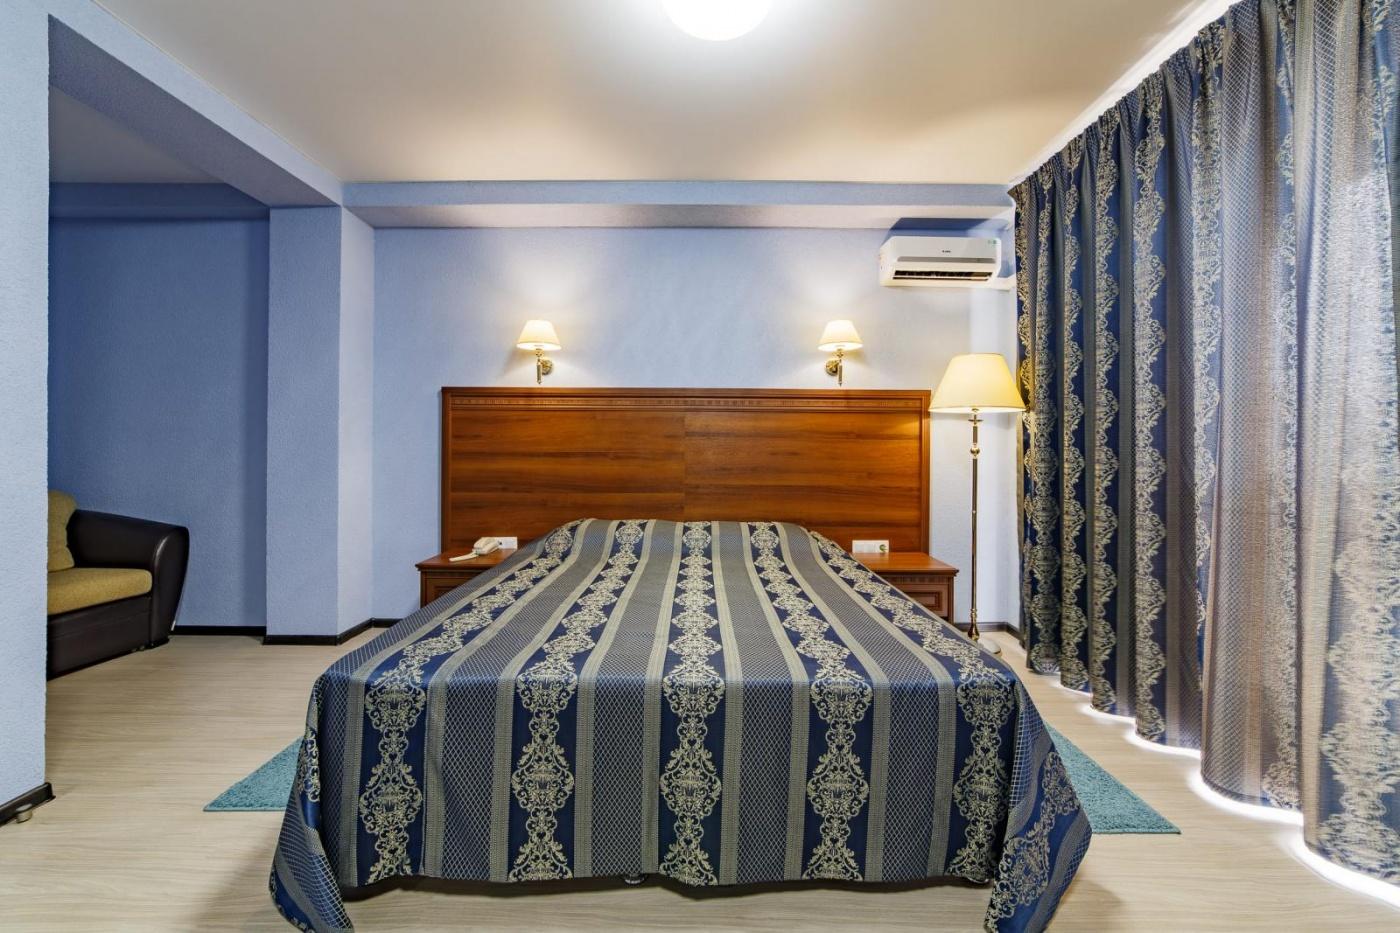 Отель «Relax» Краснодарский край Delux, фото 3